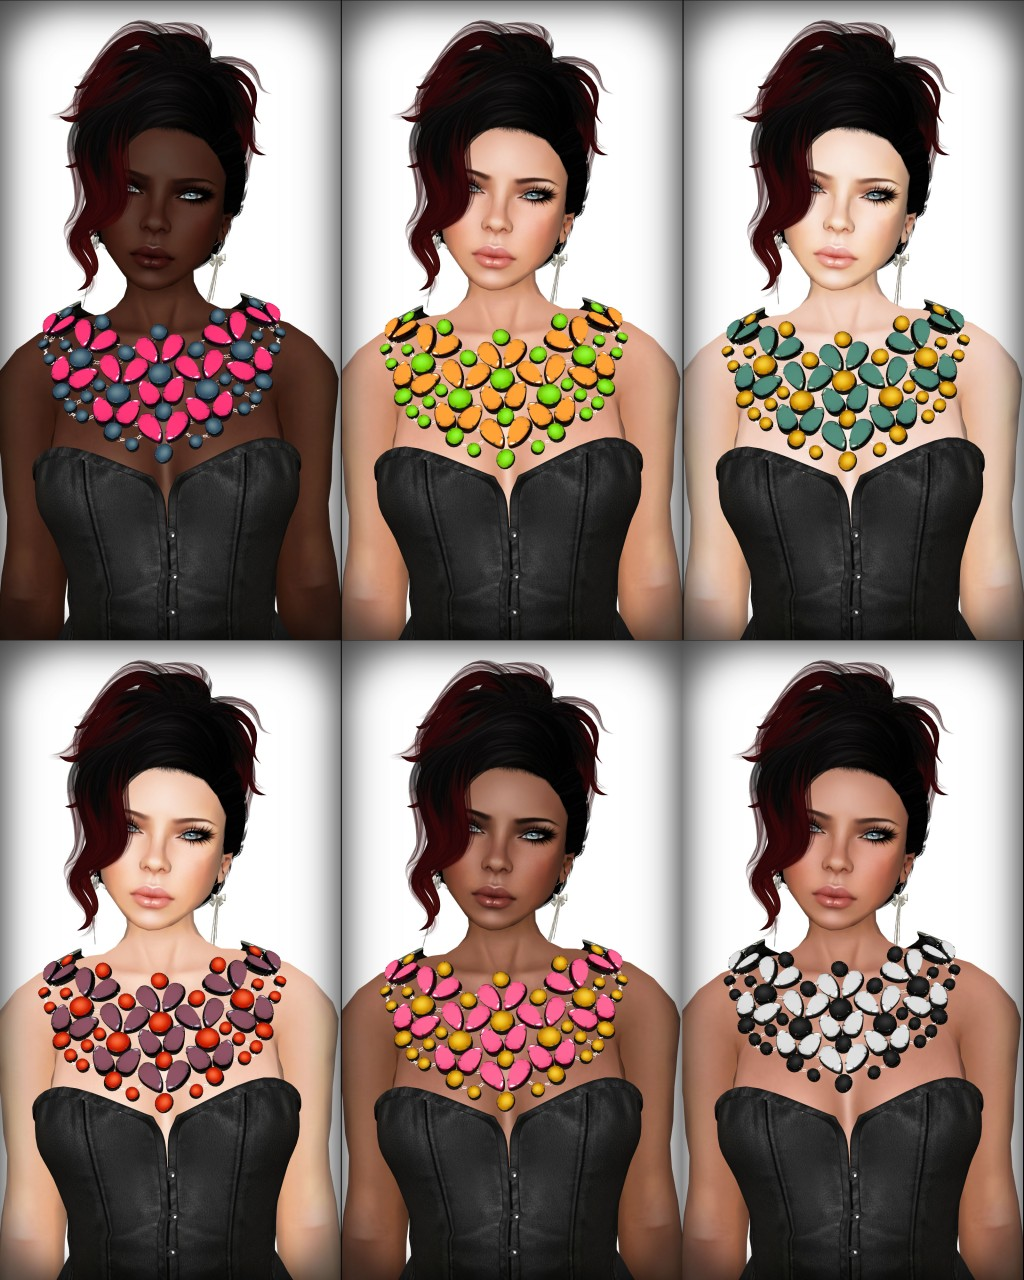 Glam Affair - Amberly all skintones